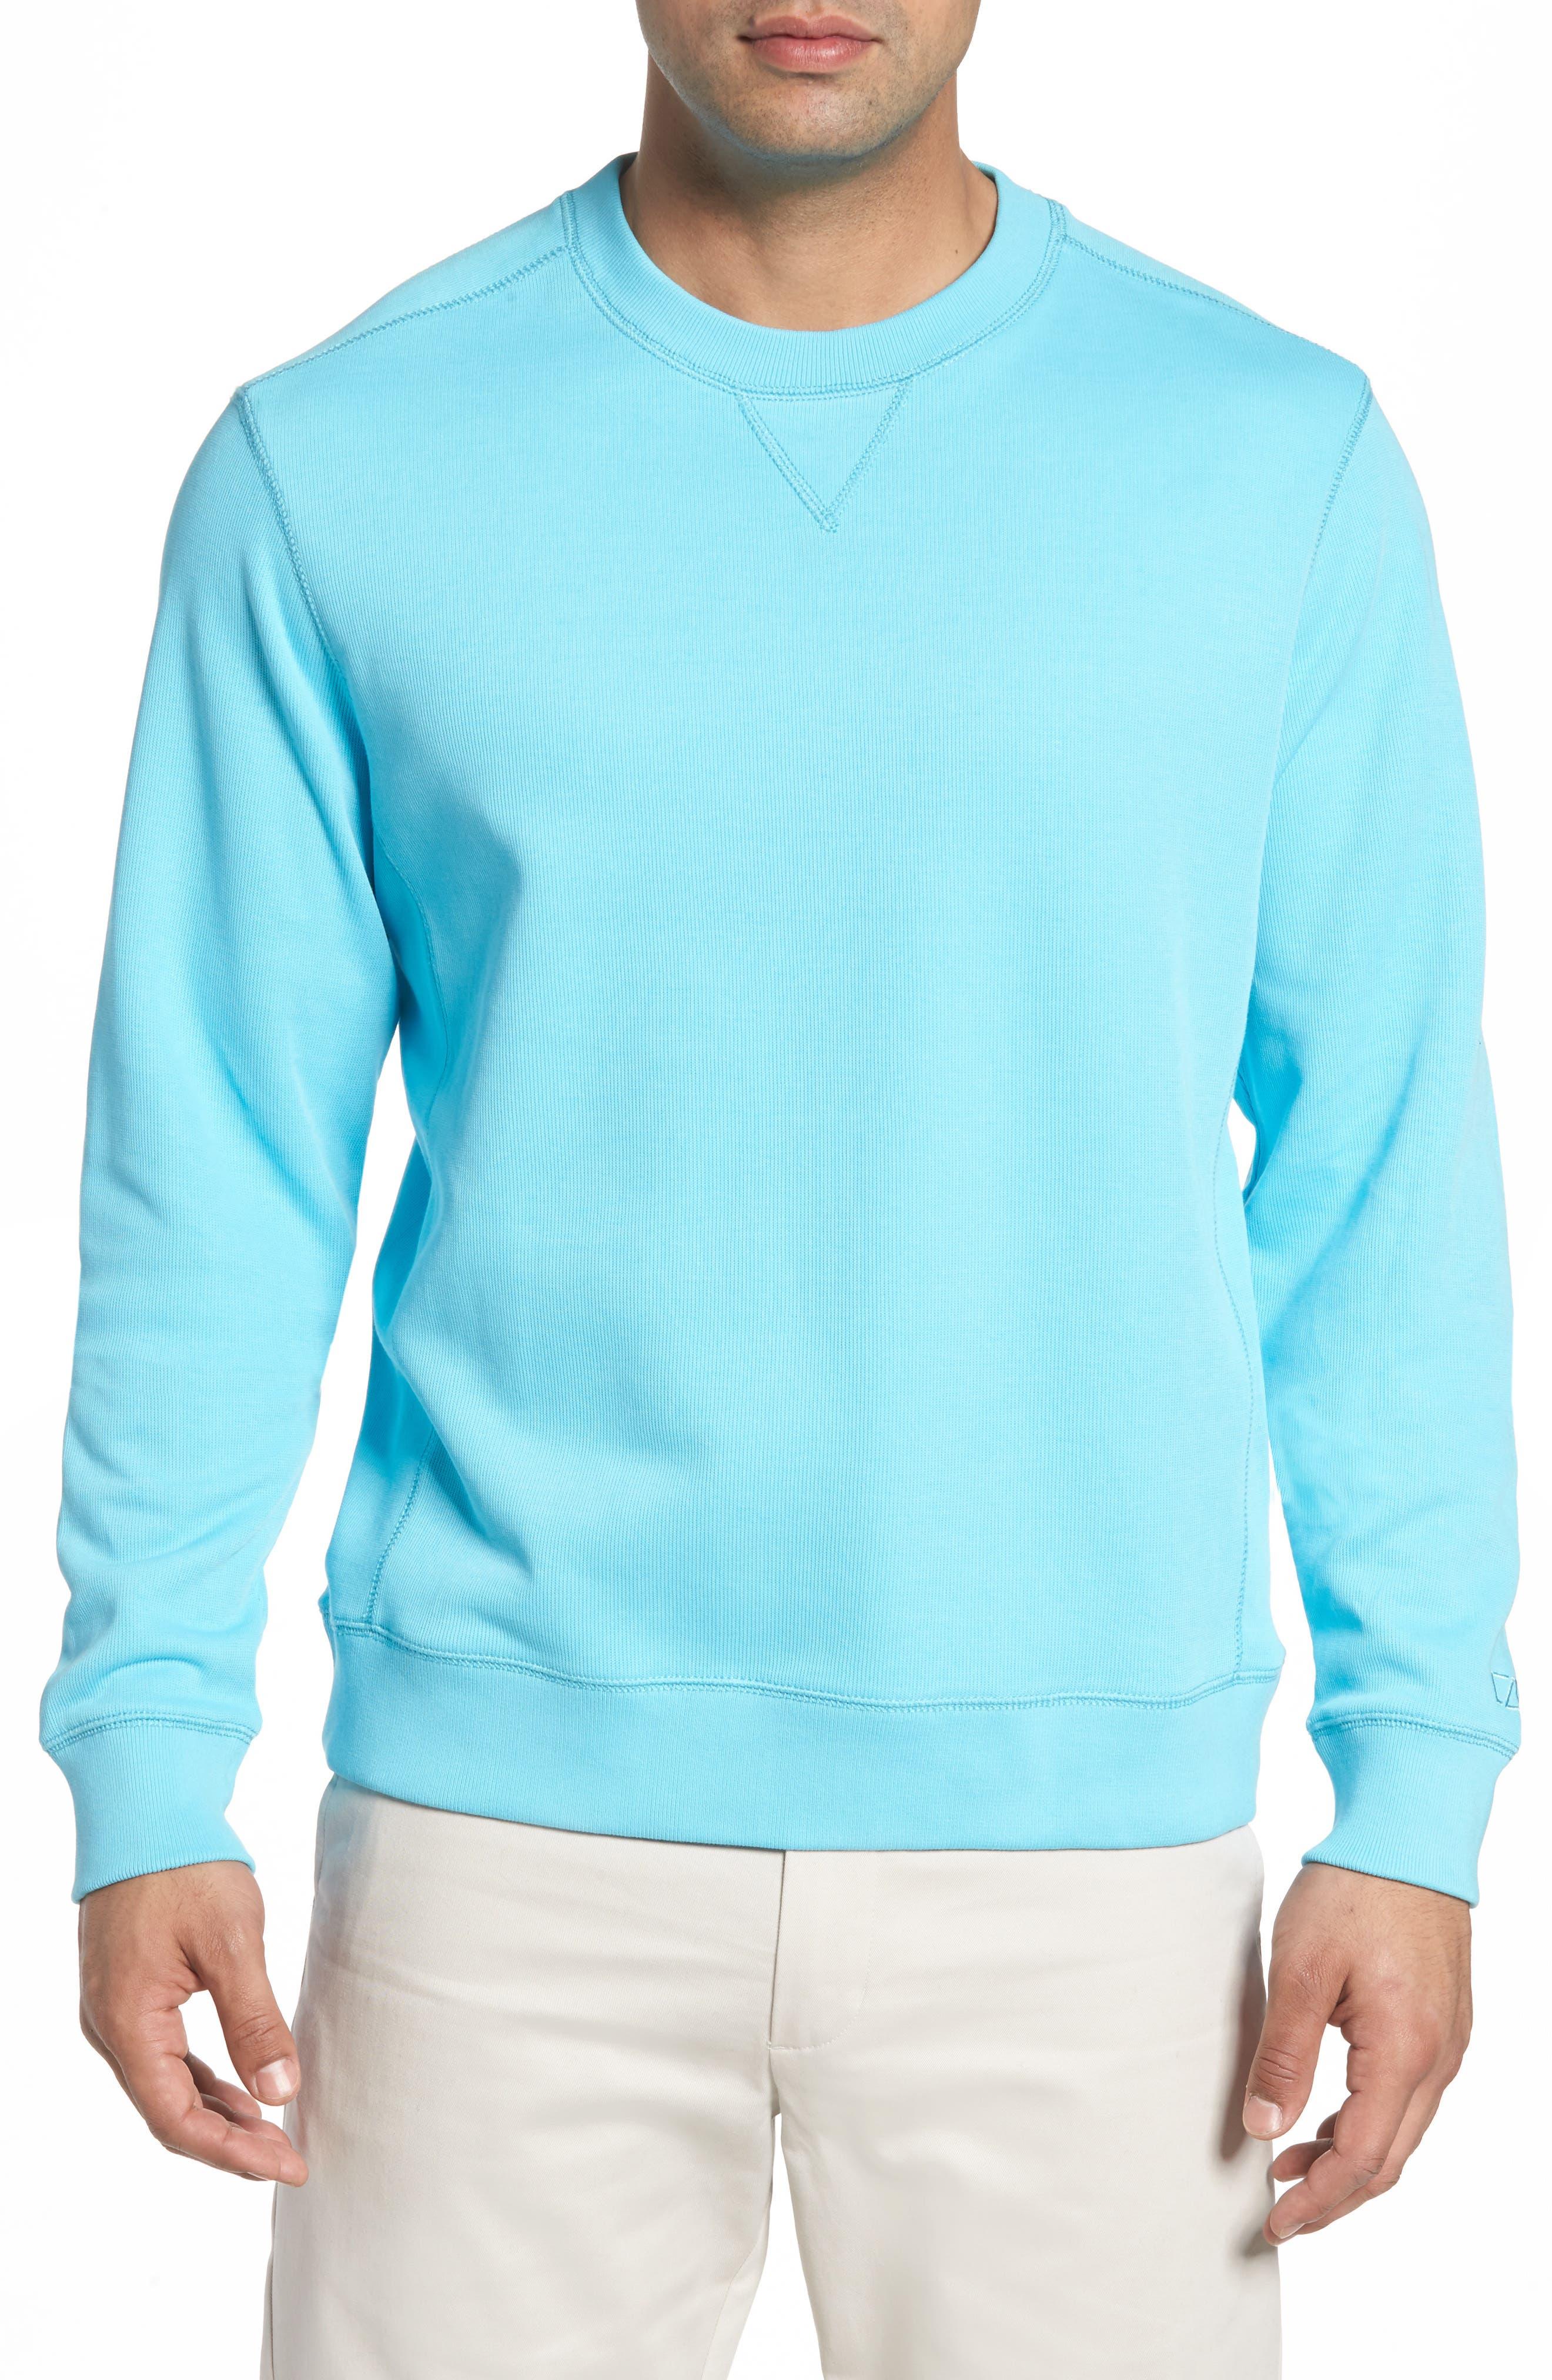 Alternate Image 1 Selected - Cutter & Buck Bayview Crewneck Sweatshirt